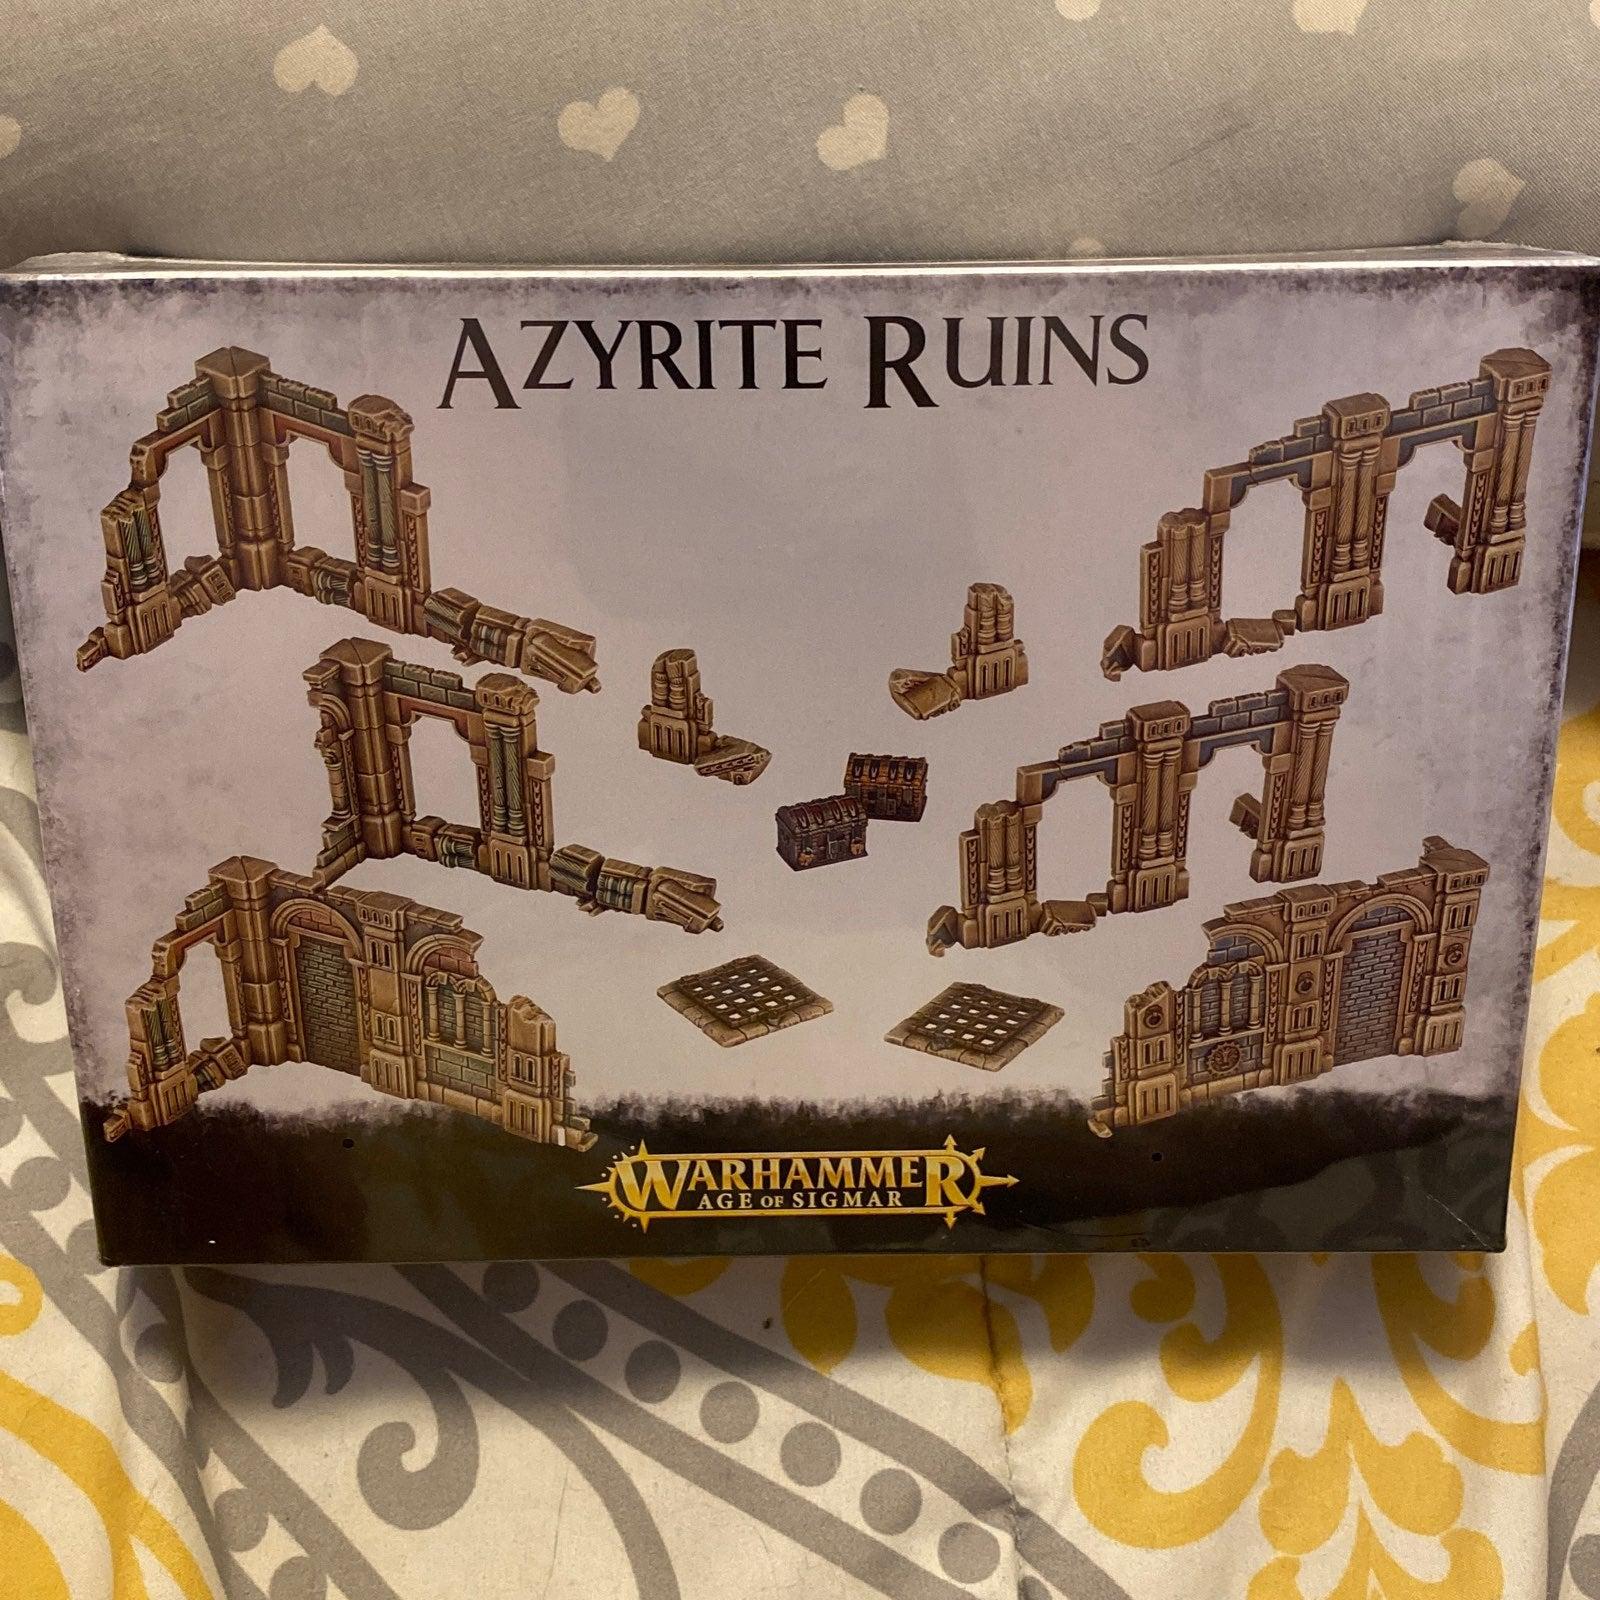 Warhammer Age Of Sigmar Azyrite Ruins